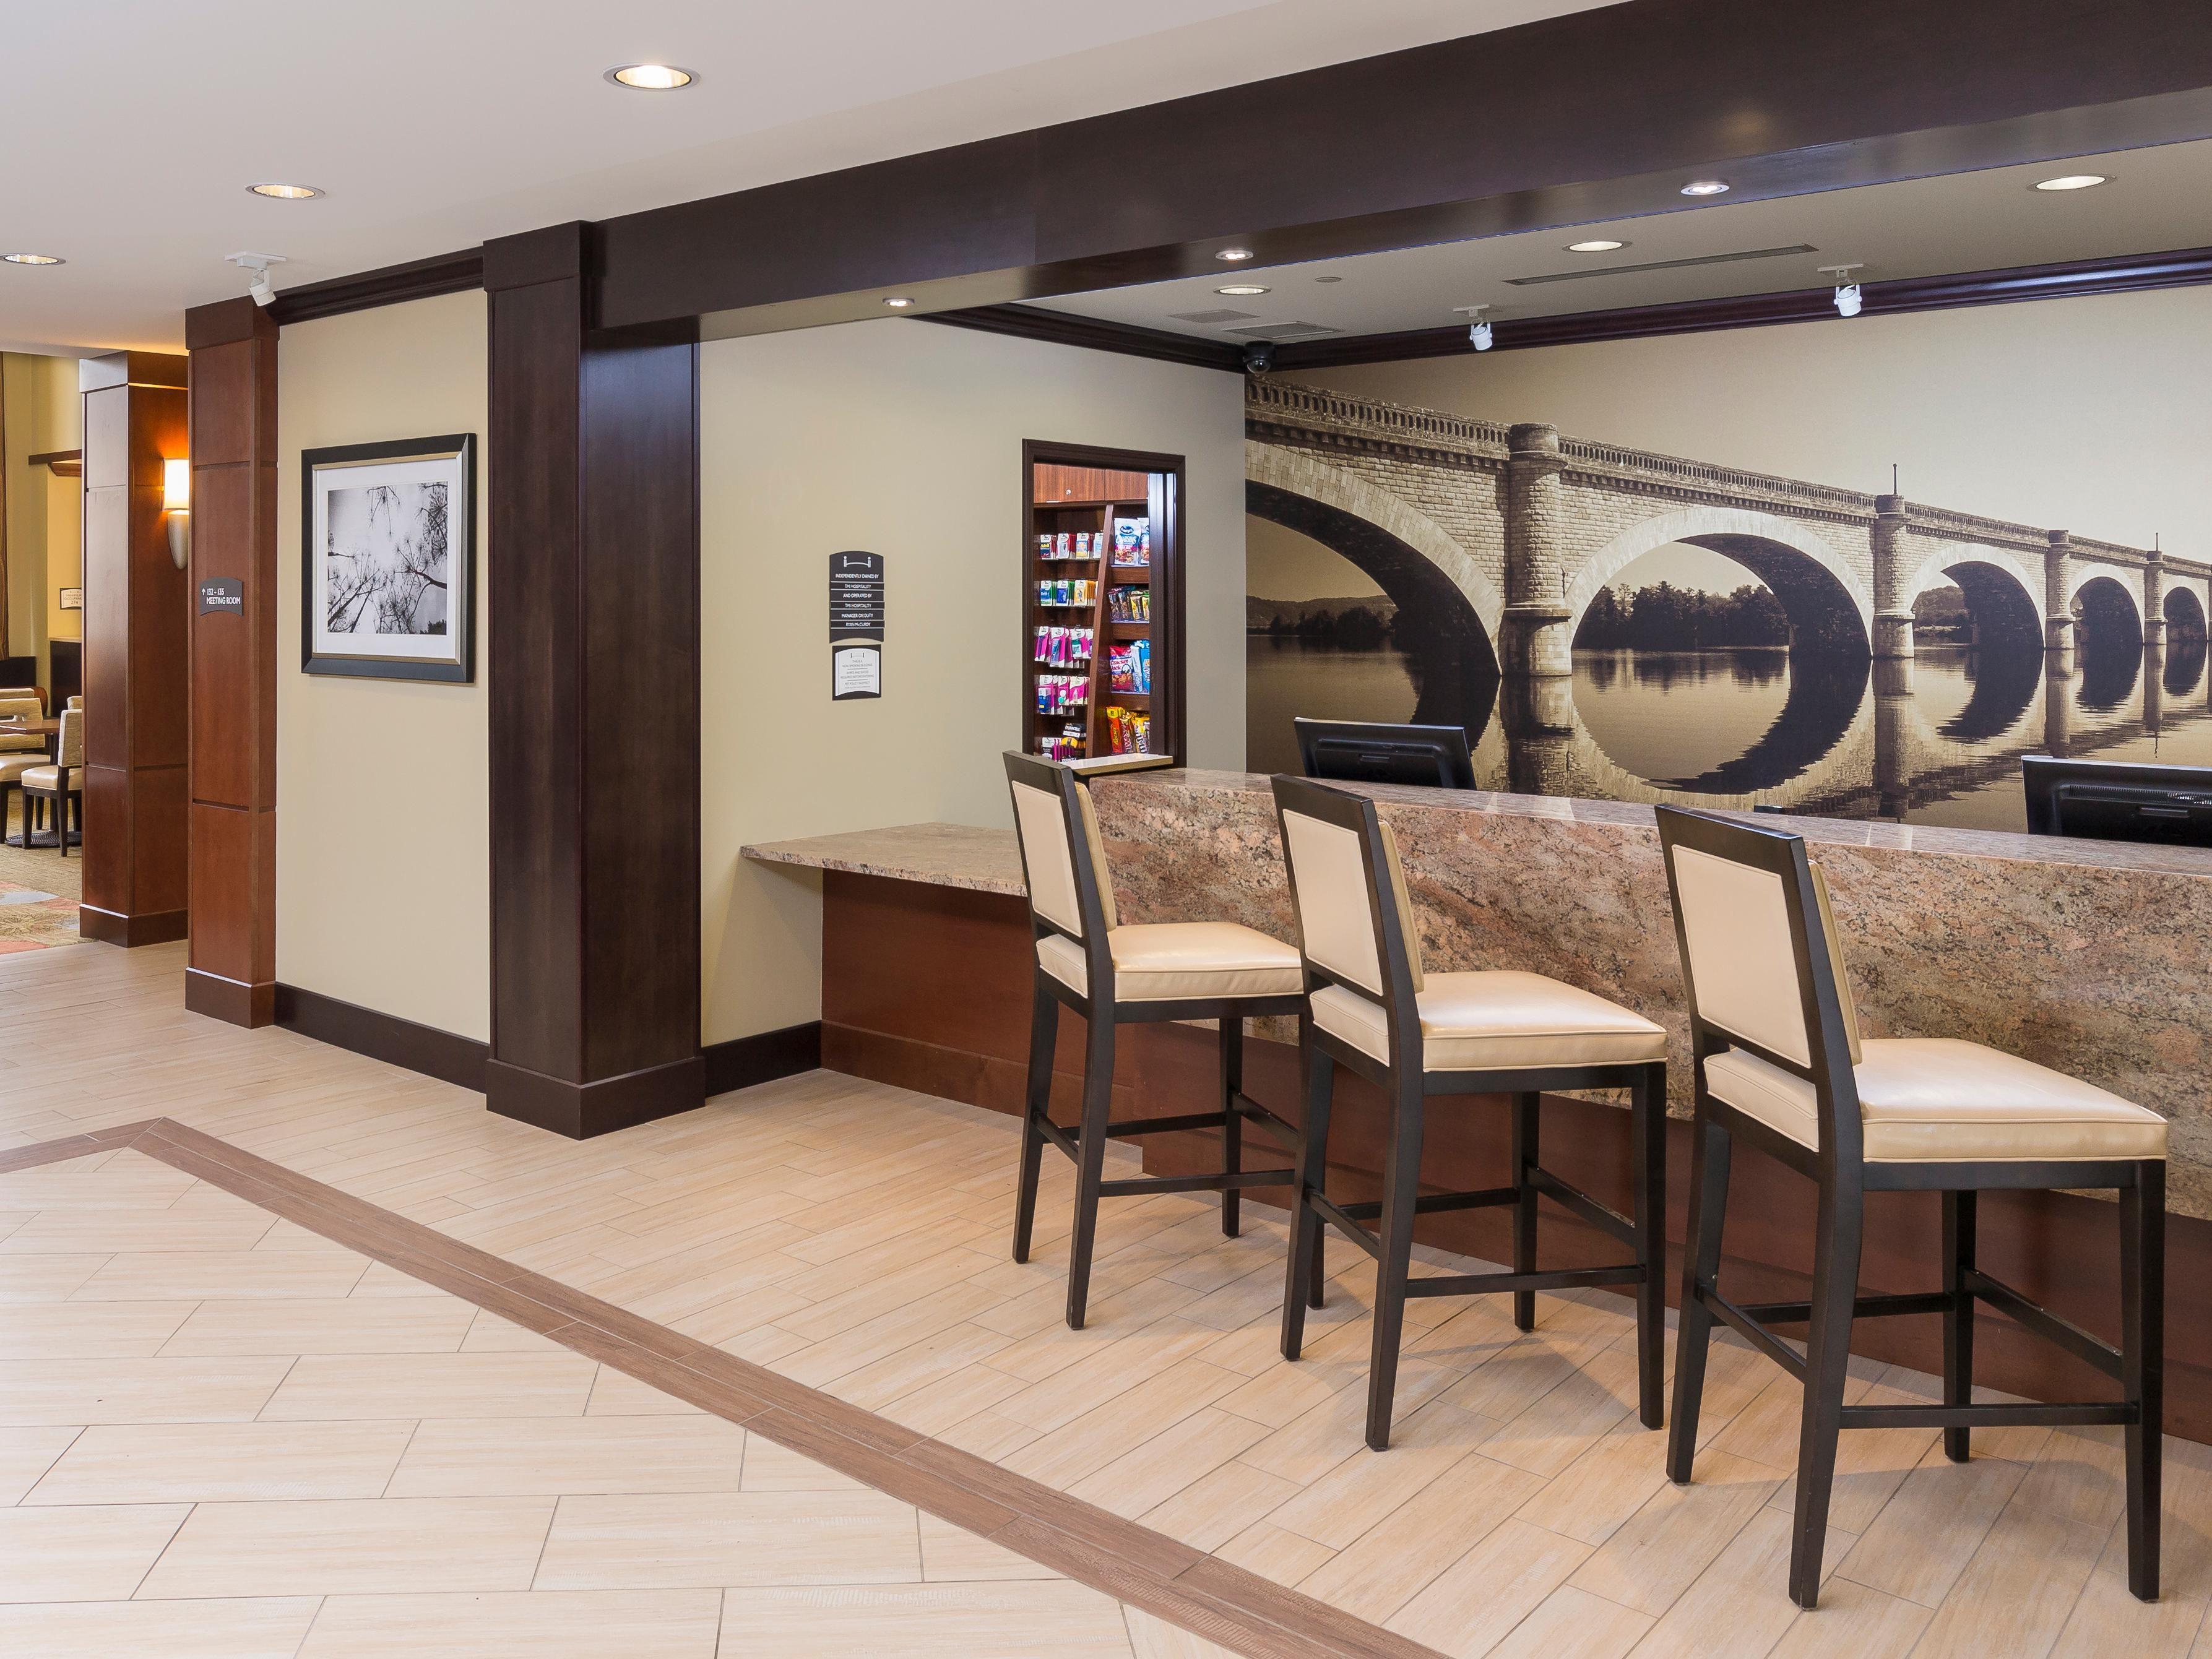 Staybridge Suites Canton Room & Amenities